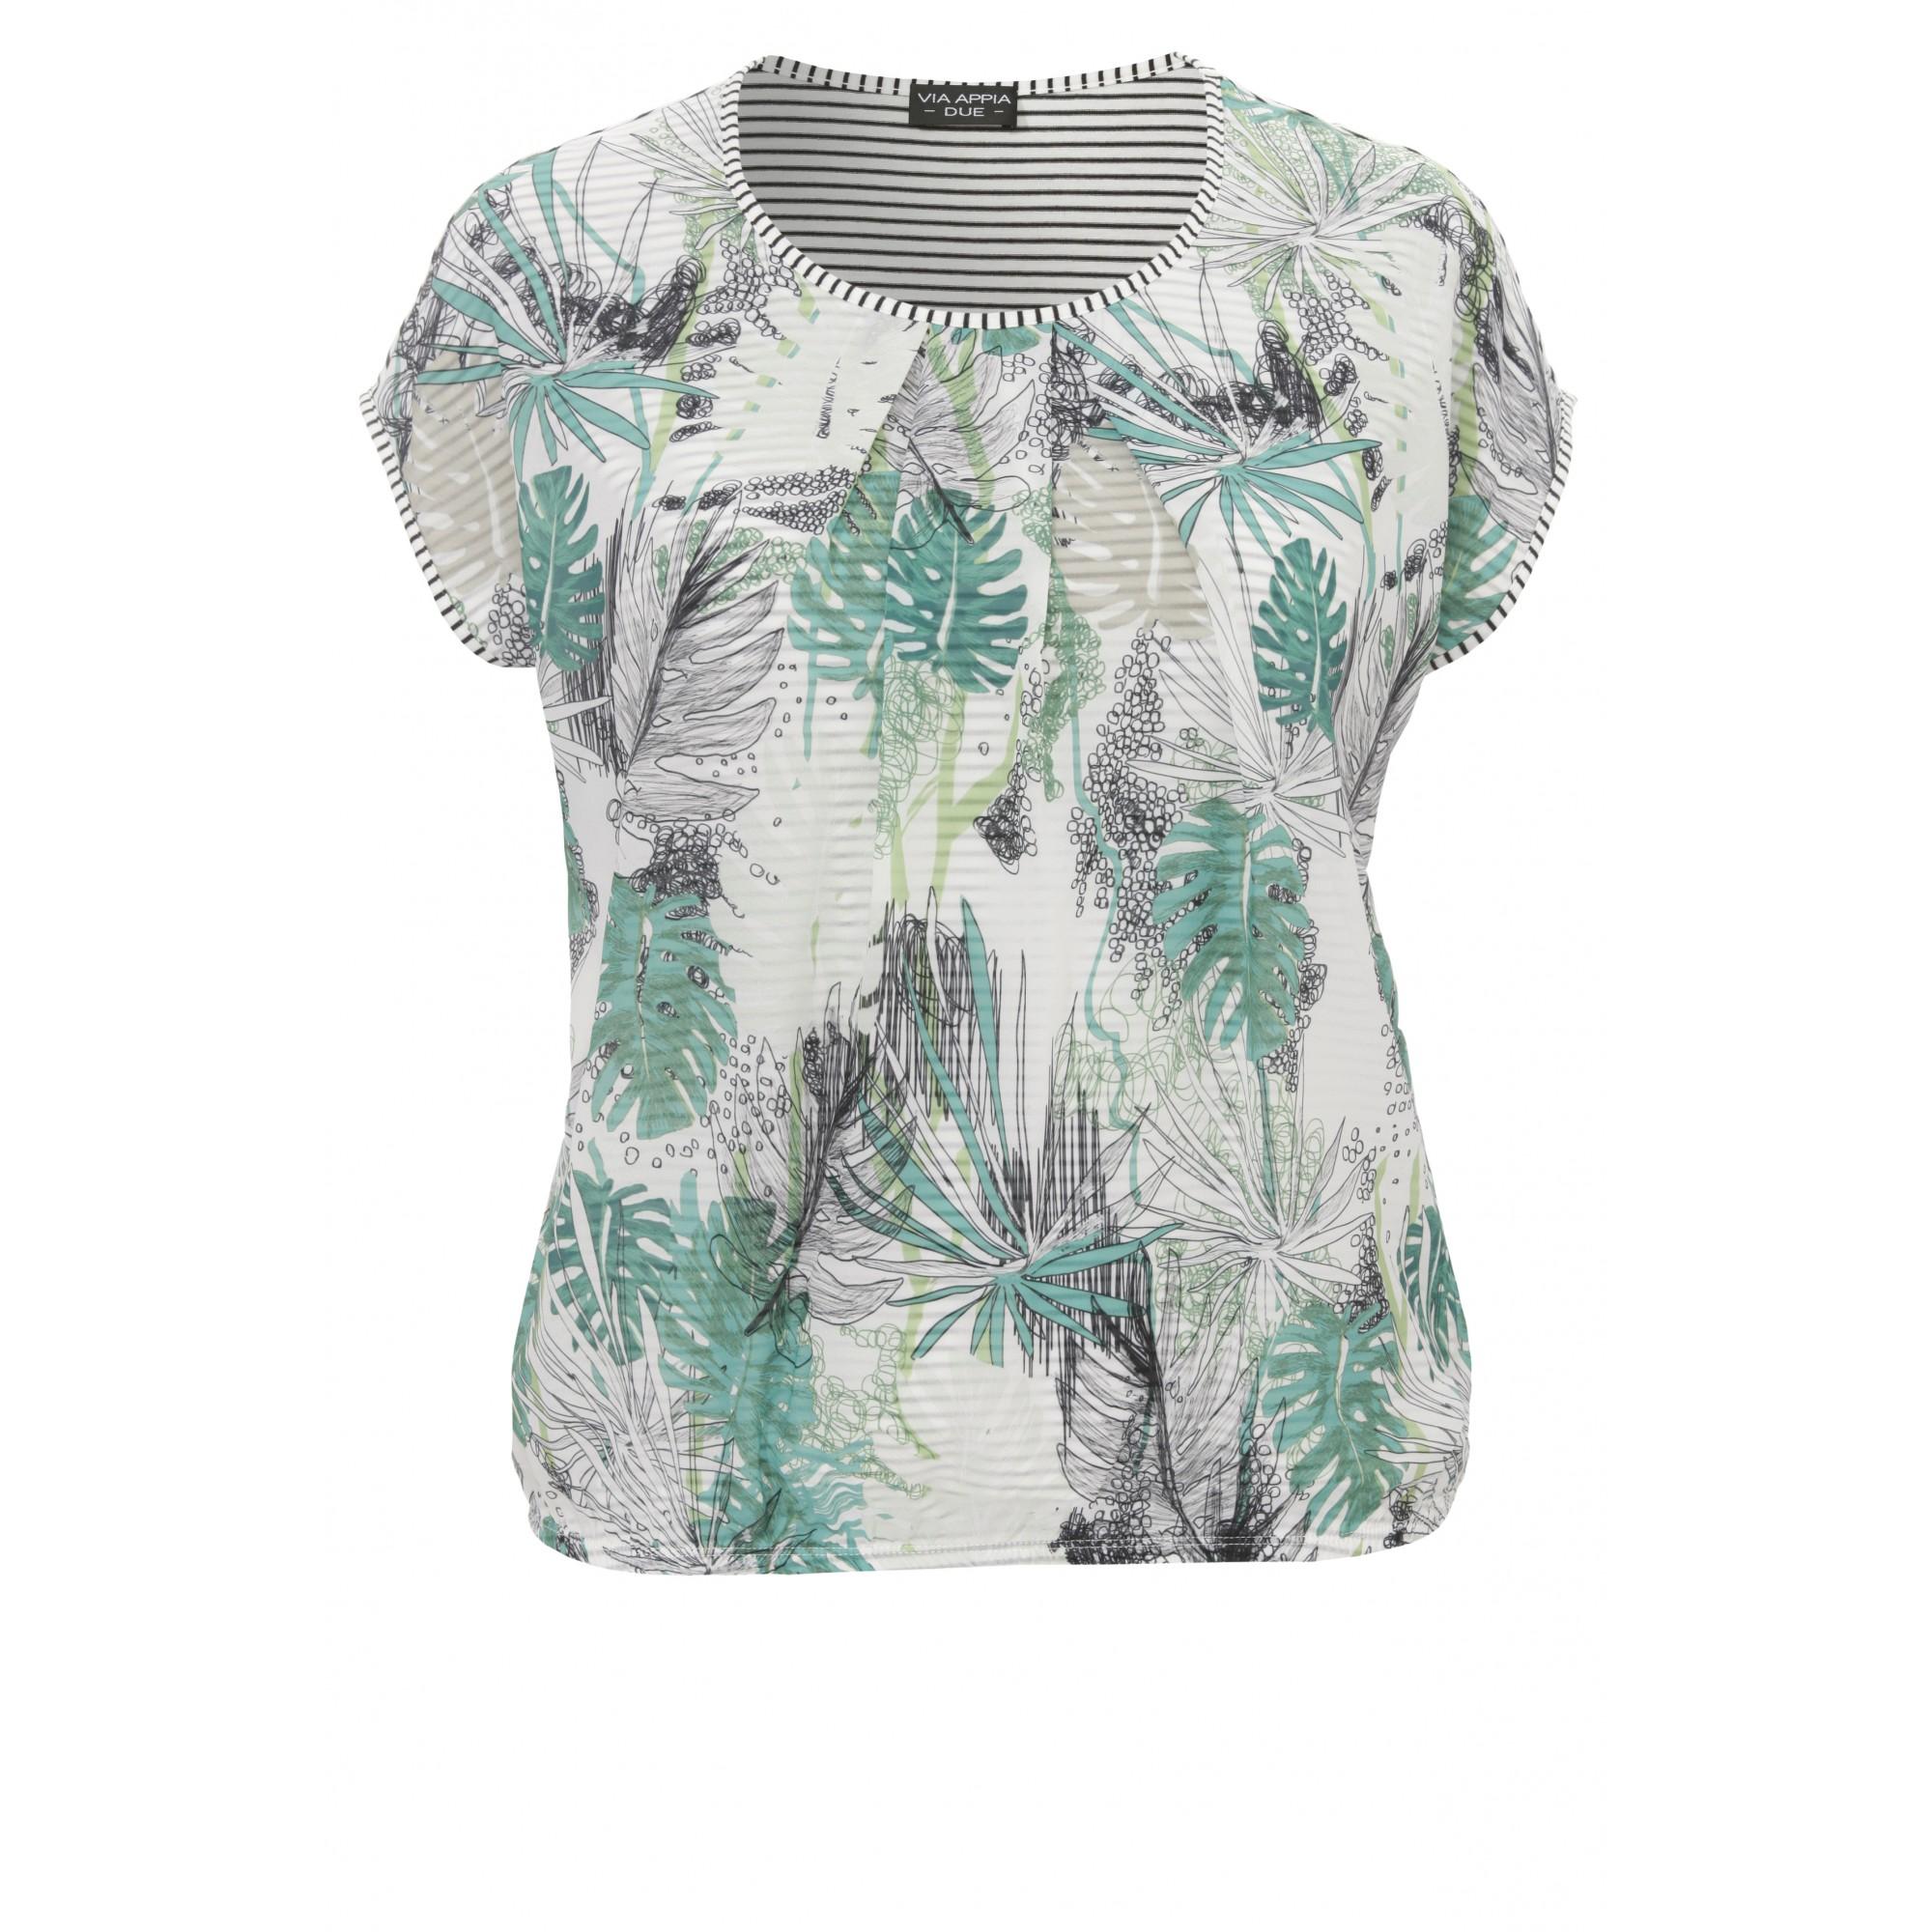 Feminines Shirt mit Mustermix